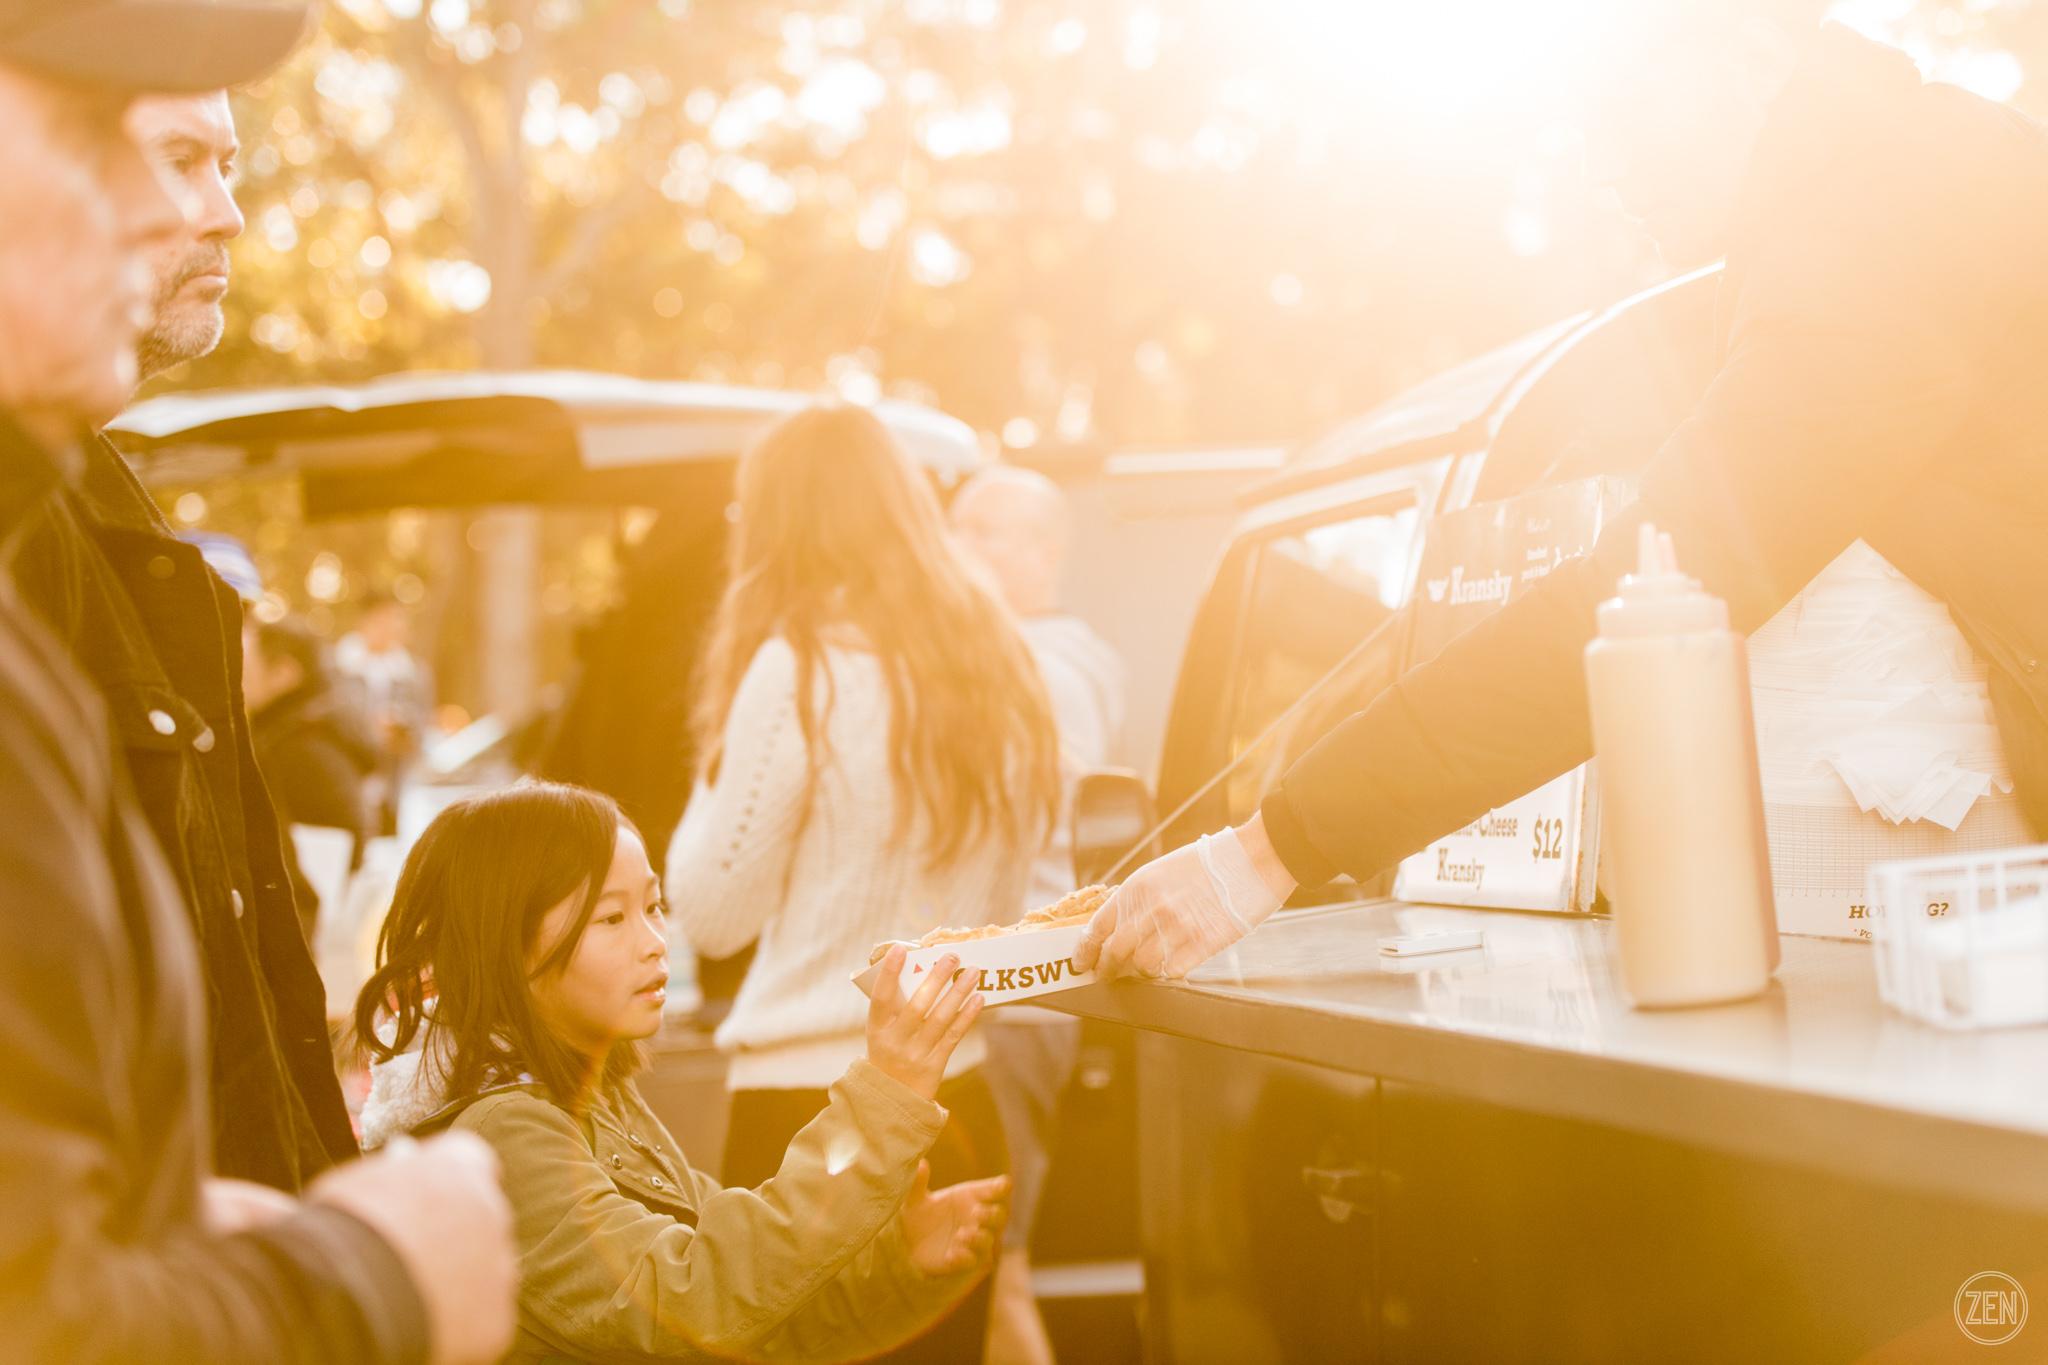 2019-07-21 - Autohaus Porches & Coffee 056